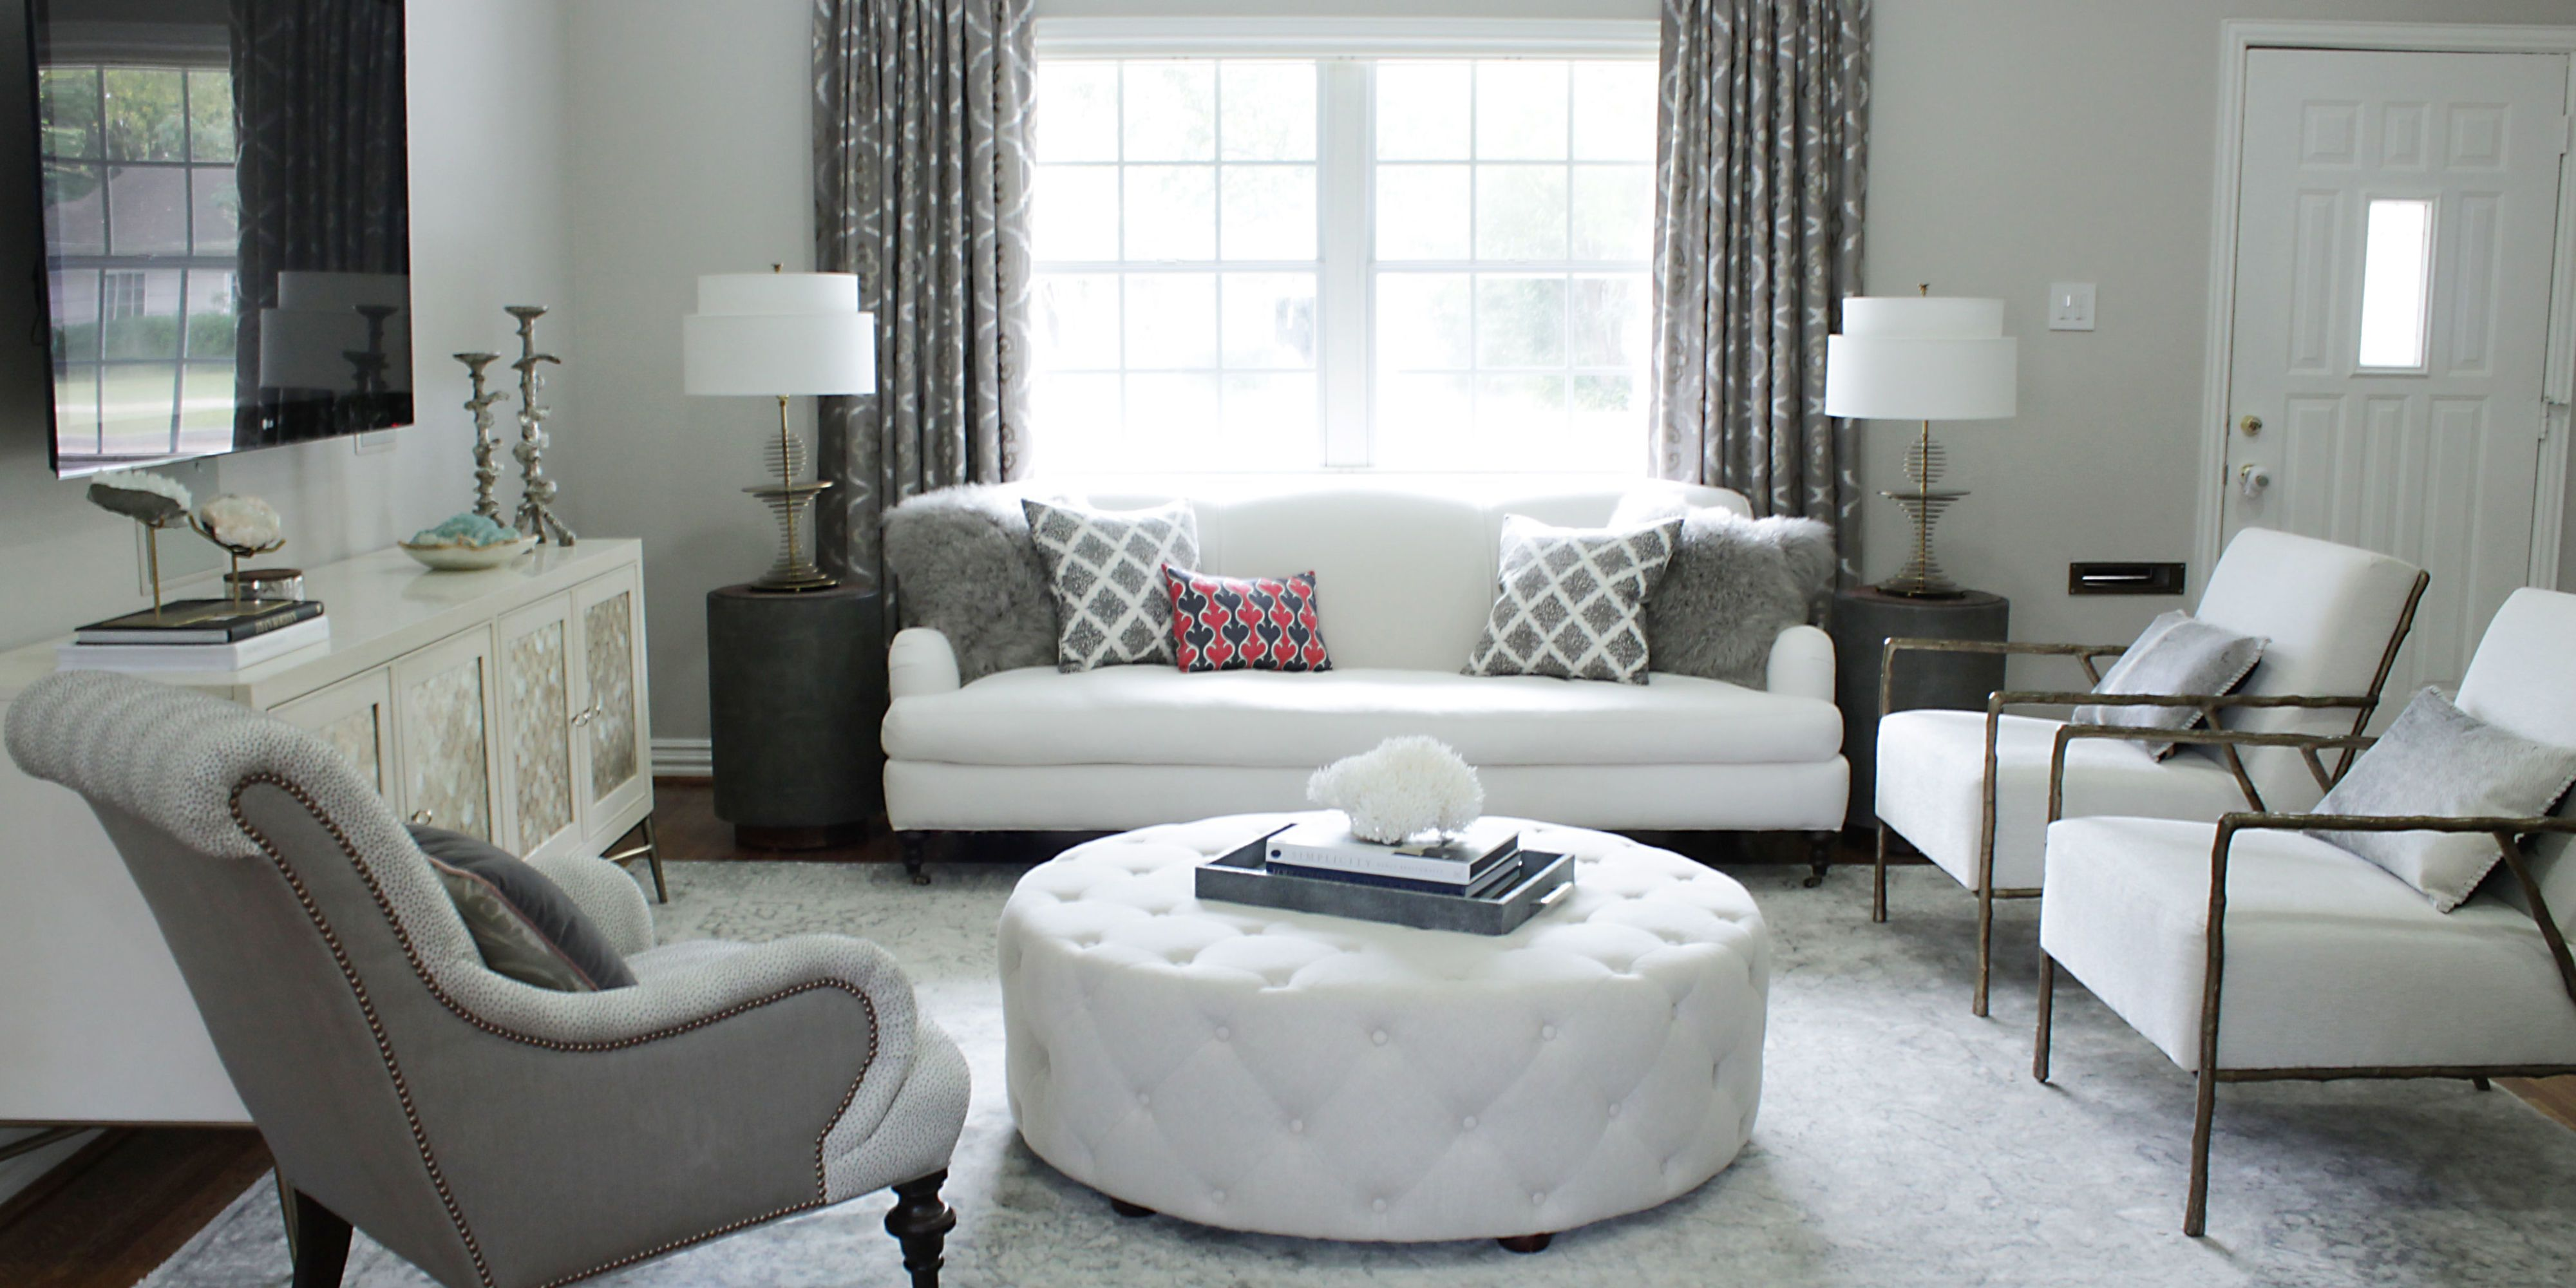 Superior Before U0026 After: An Elegant, Budget Friendly Living Room Makeover